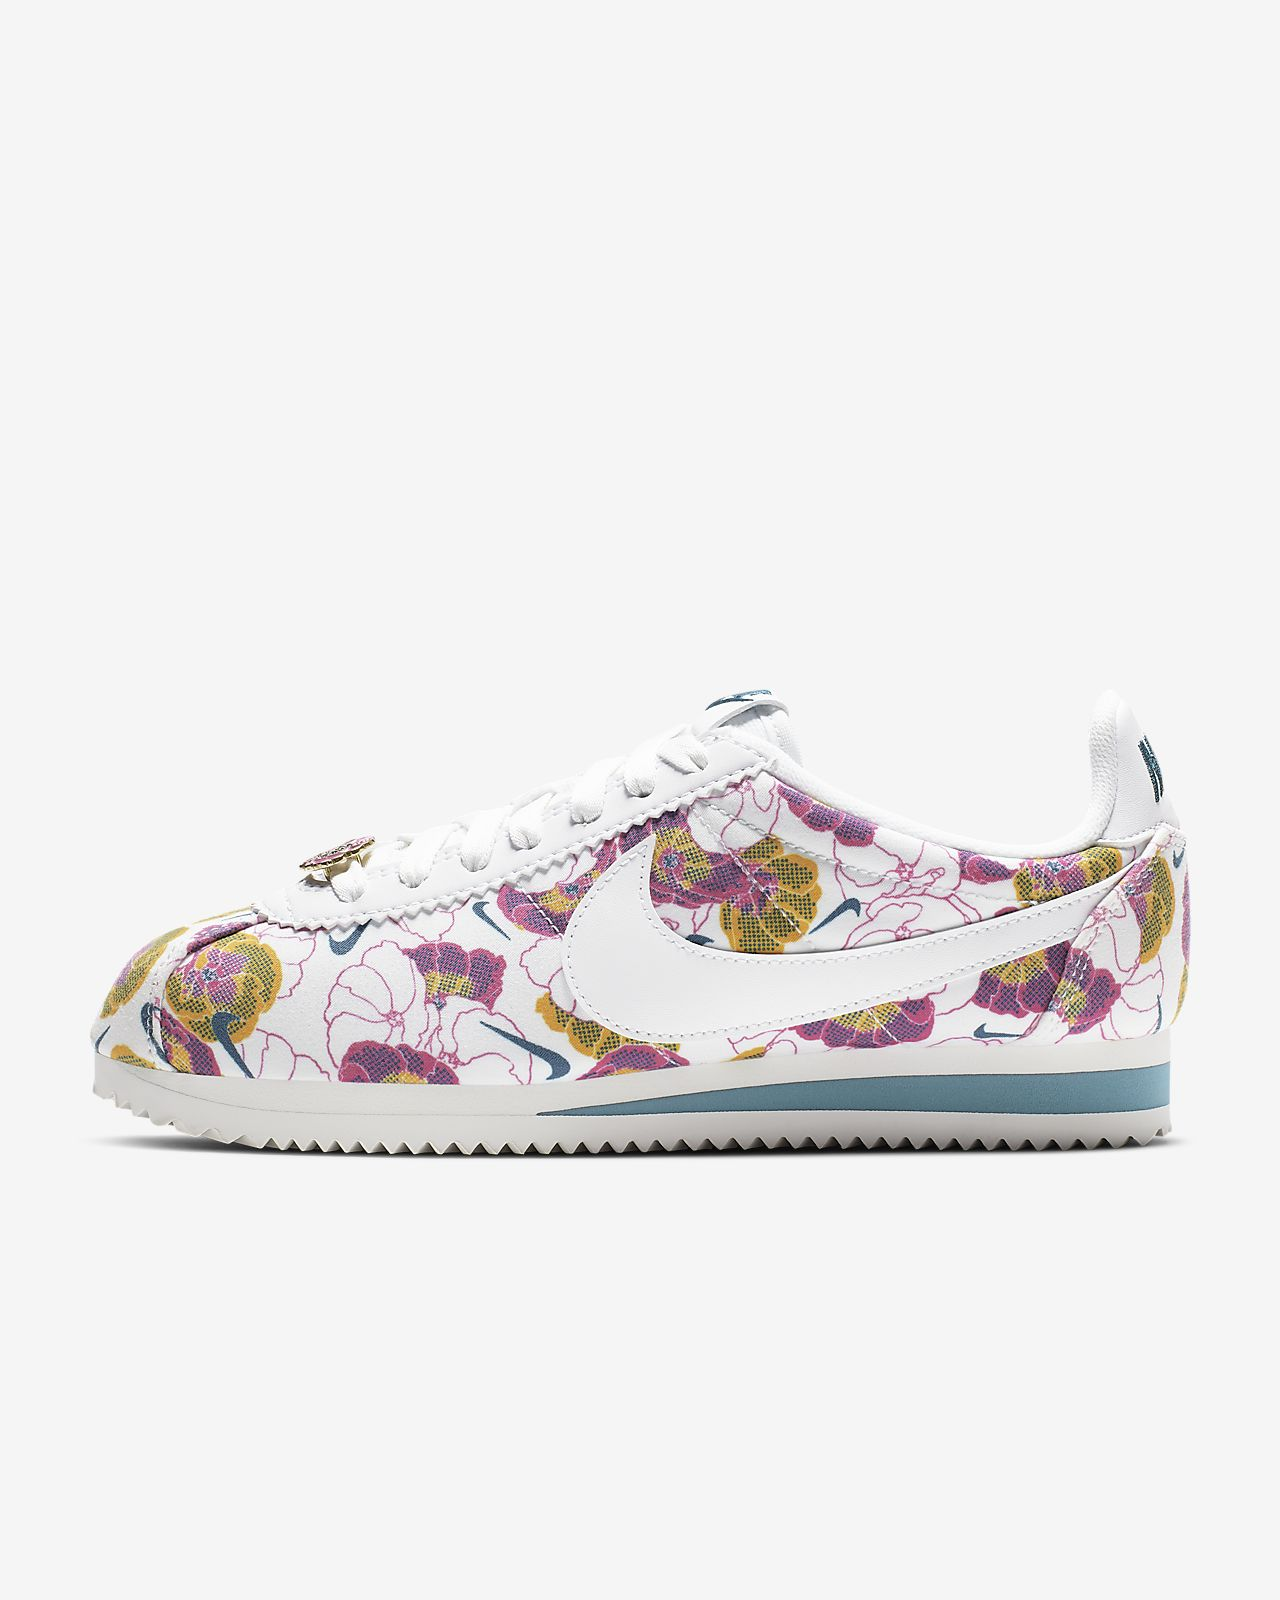 Nike Classic Cortez LX女子运动鞋